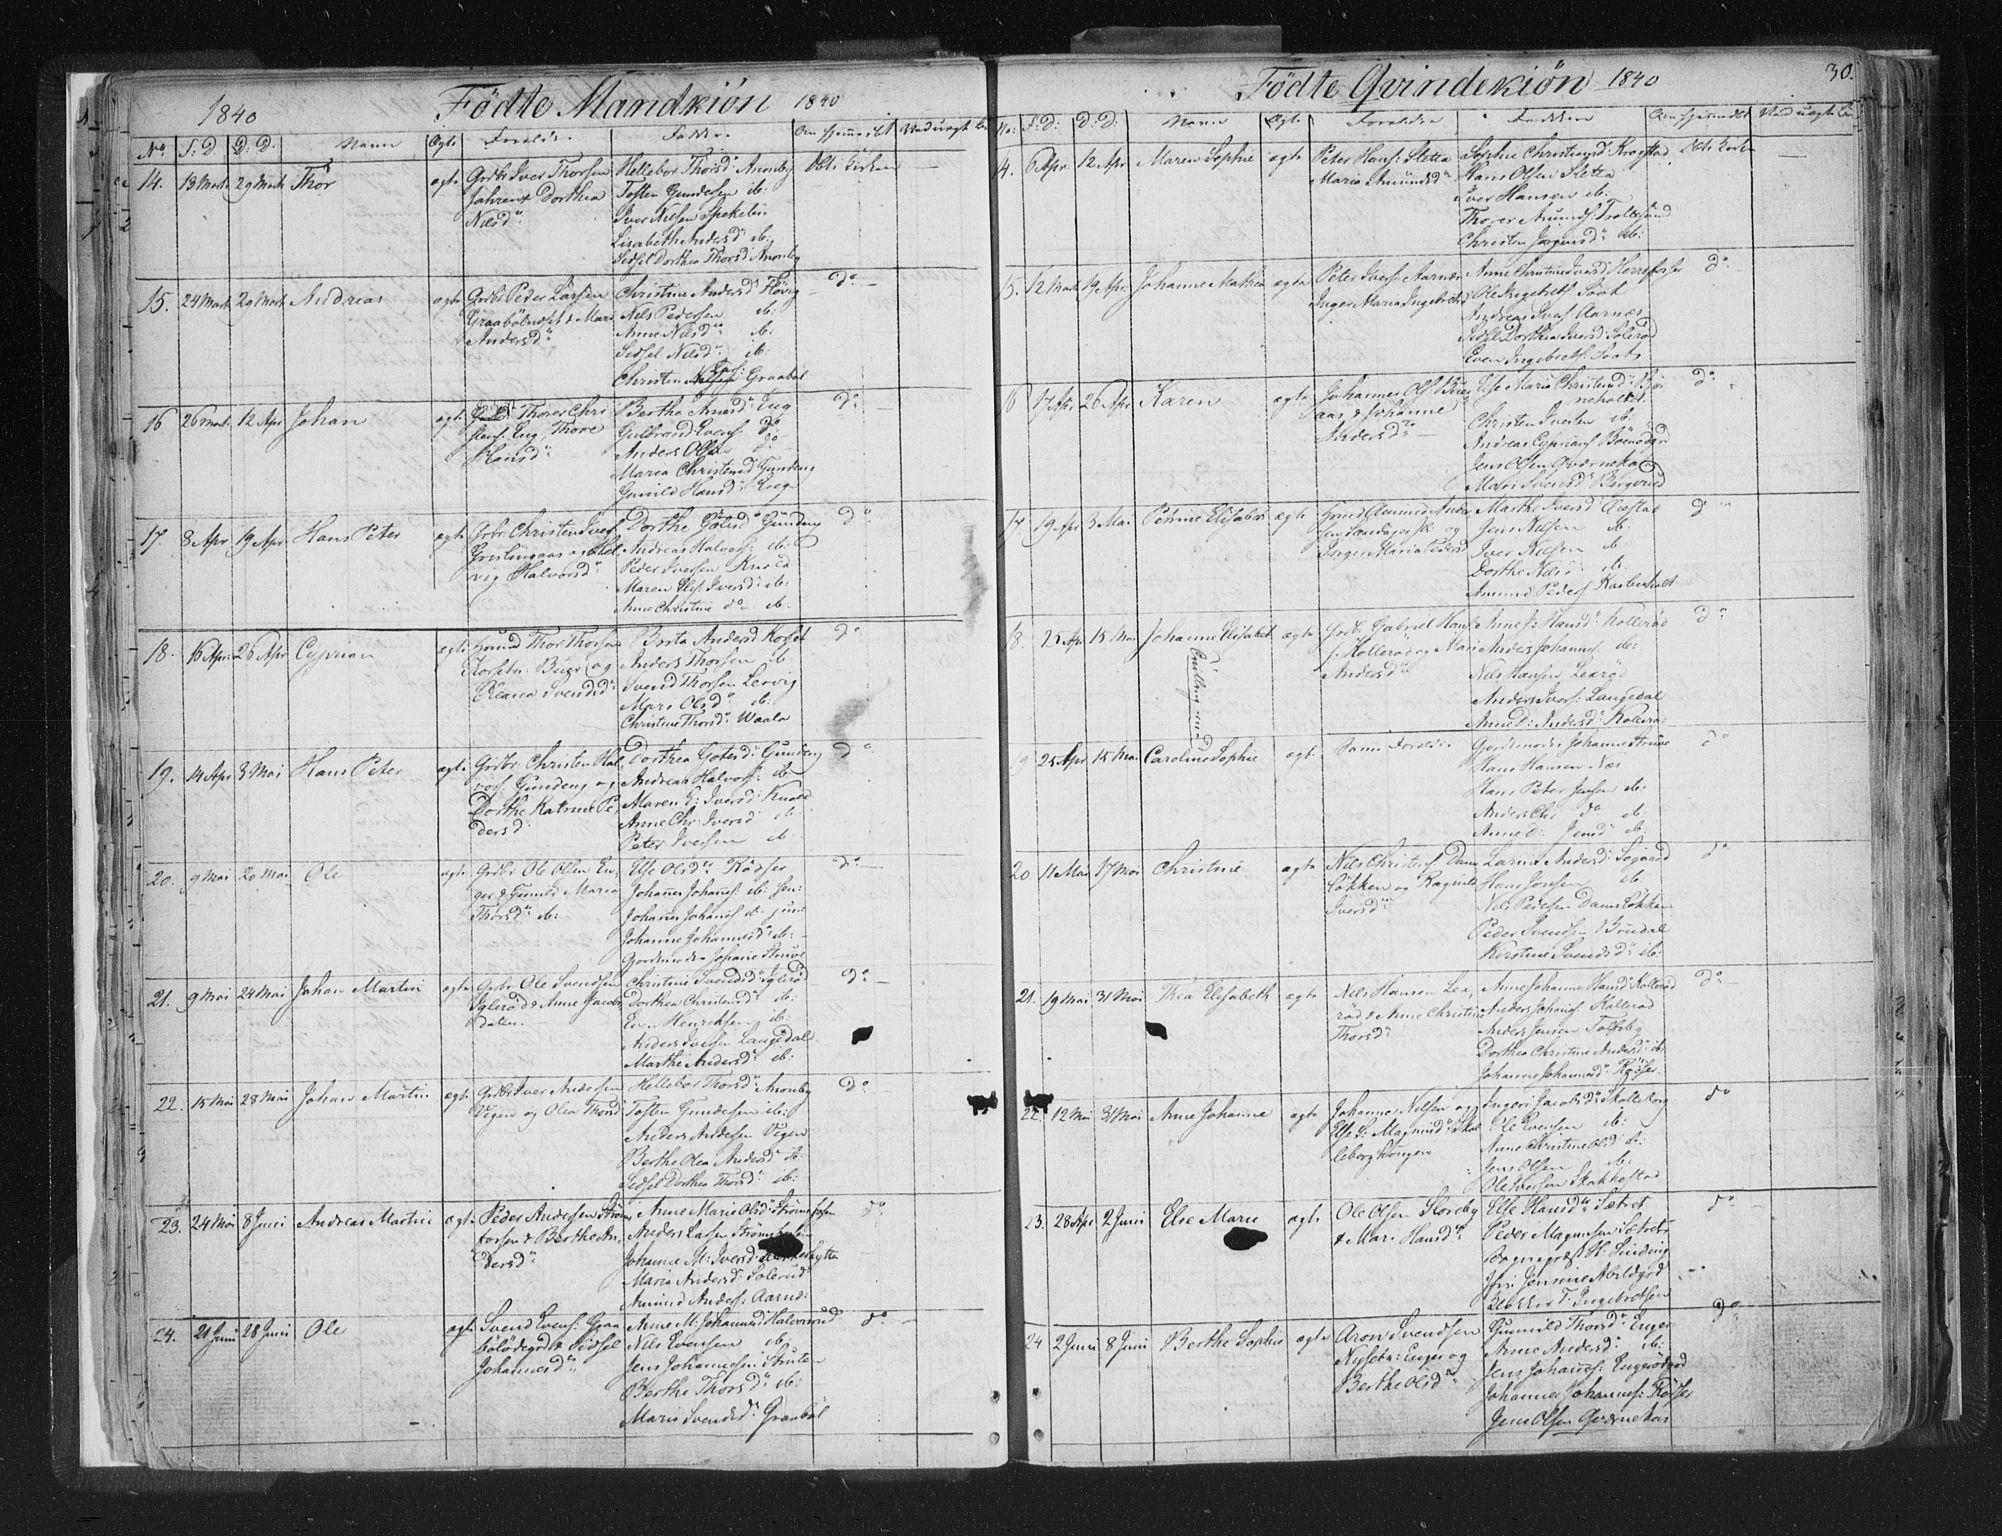 SAO, Aremark prestekontor Kirkebøker, F/Fc/L0002: Ministerialbok nr. III 2, 1834-1849, s. 30